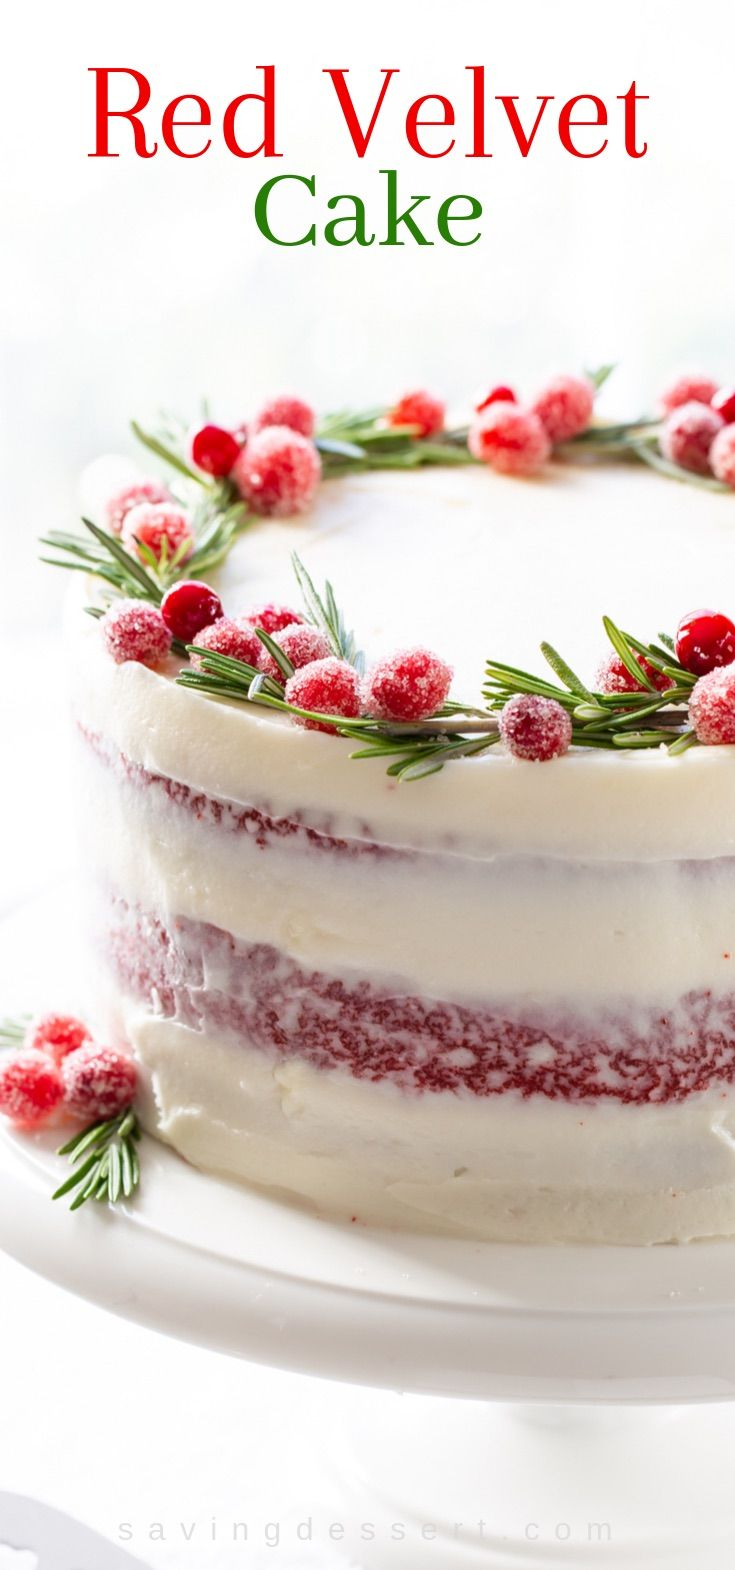 Red Velvet Cake Recipe Recipe Red Velvet Cake Recipe Red Velvet Cake Velvet Cake Recipes